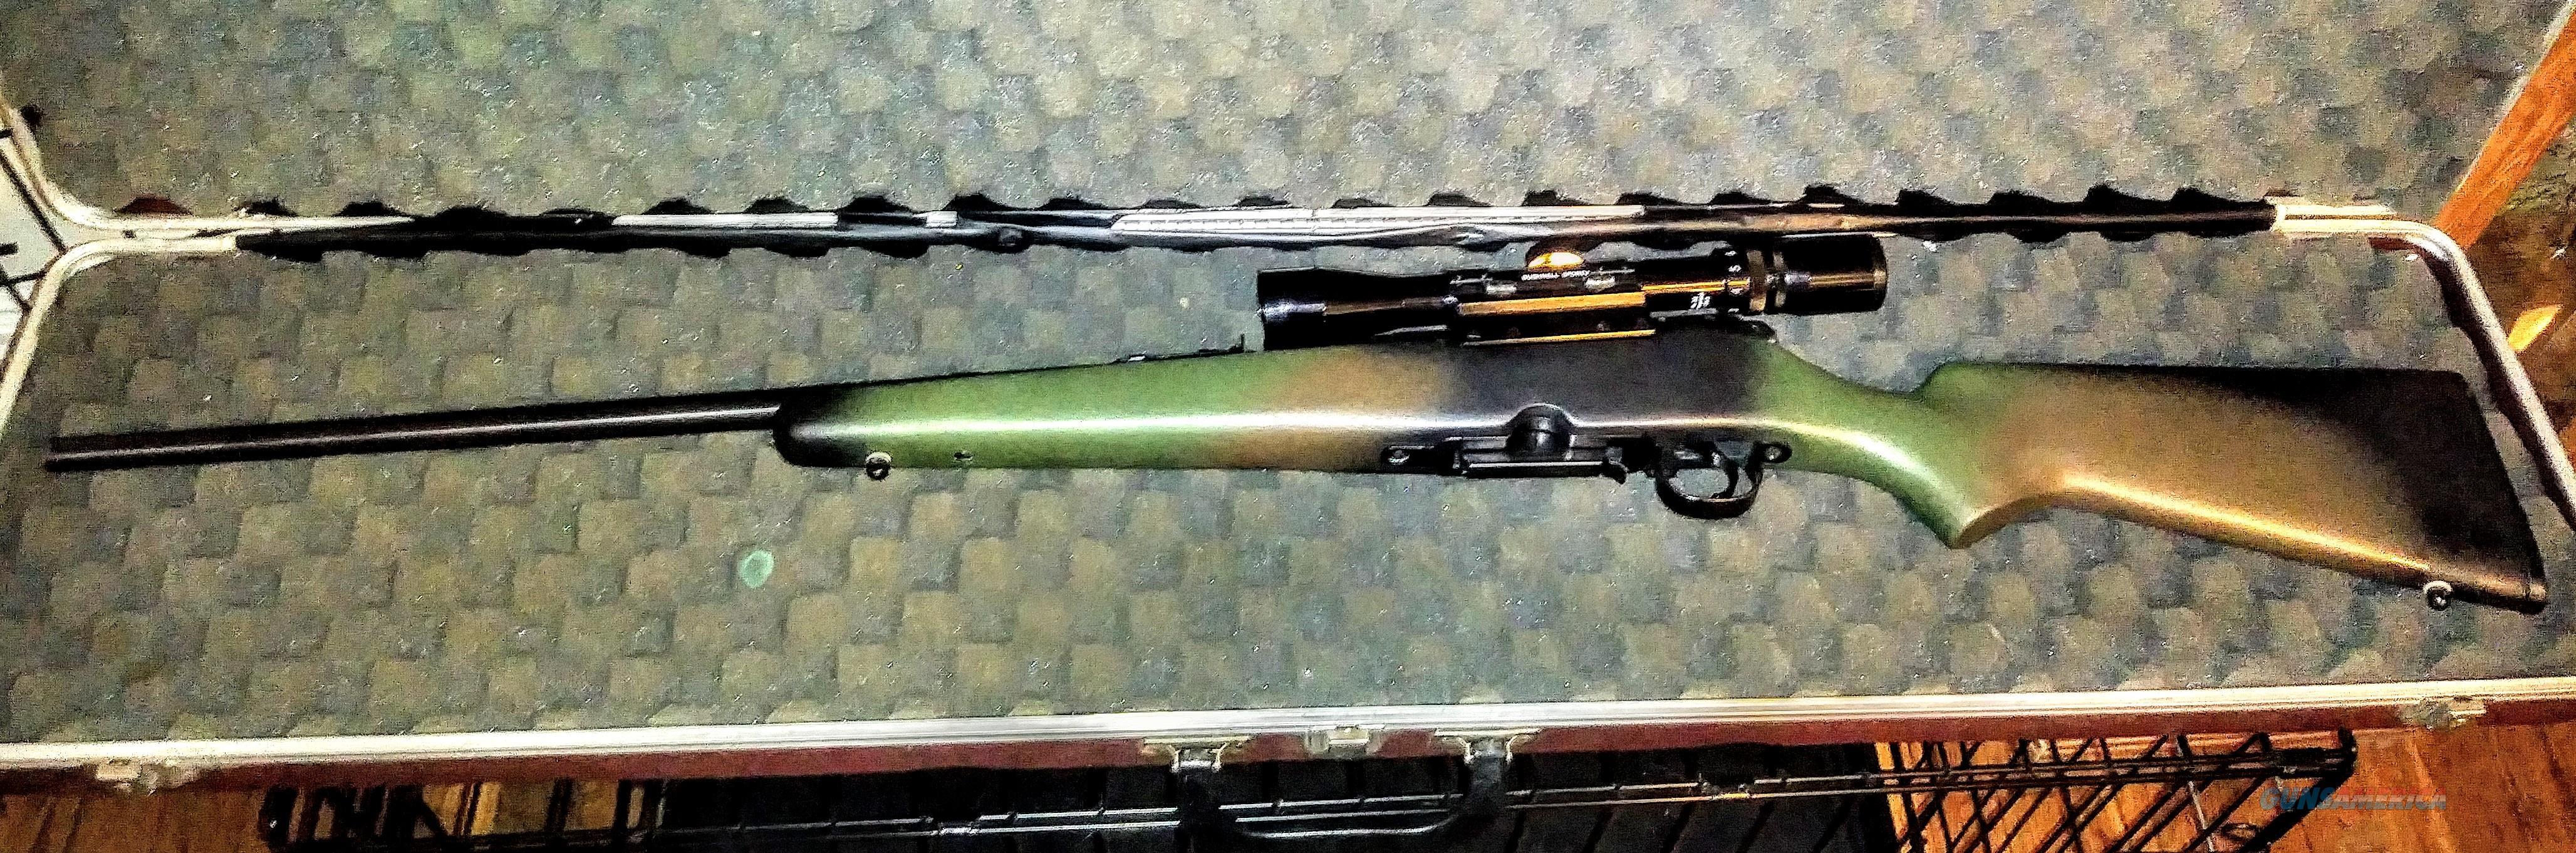 Savage Springfield 840 .222 bolt action rifle  Guns > Rifles > Savage Rifles > Standard Bolt Action > Sporting